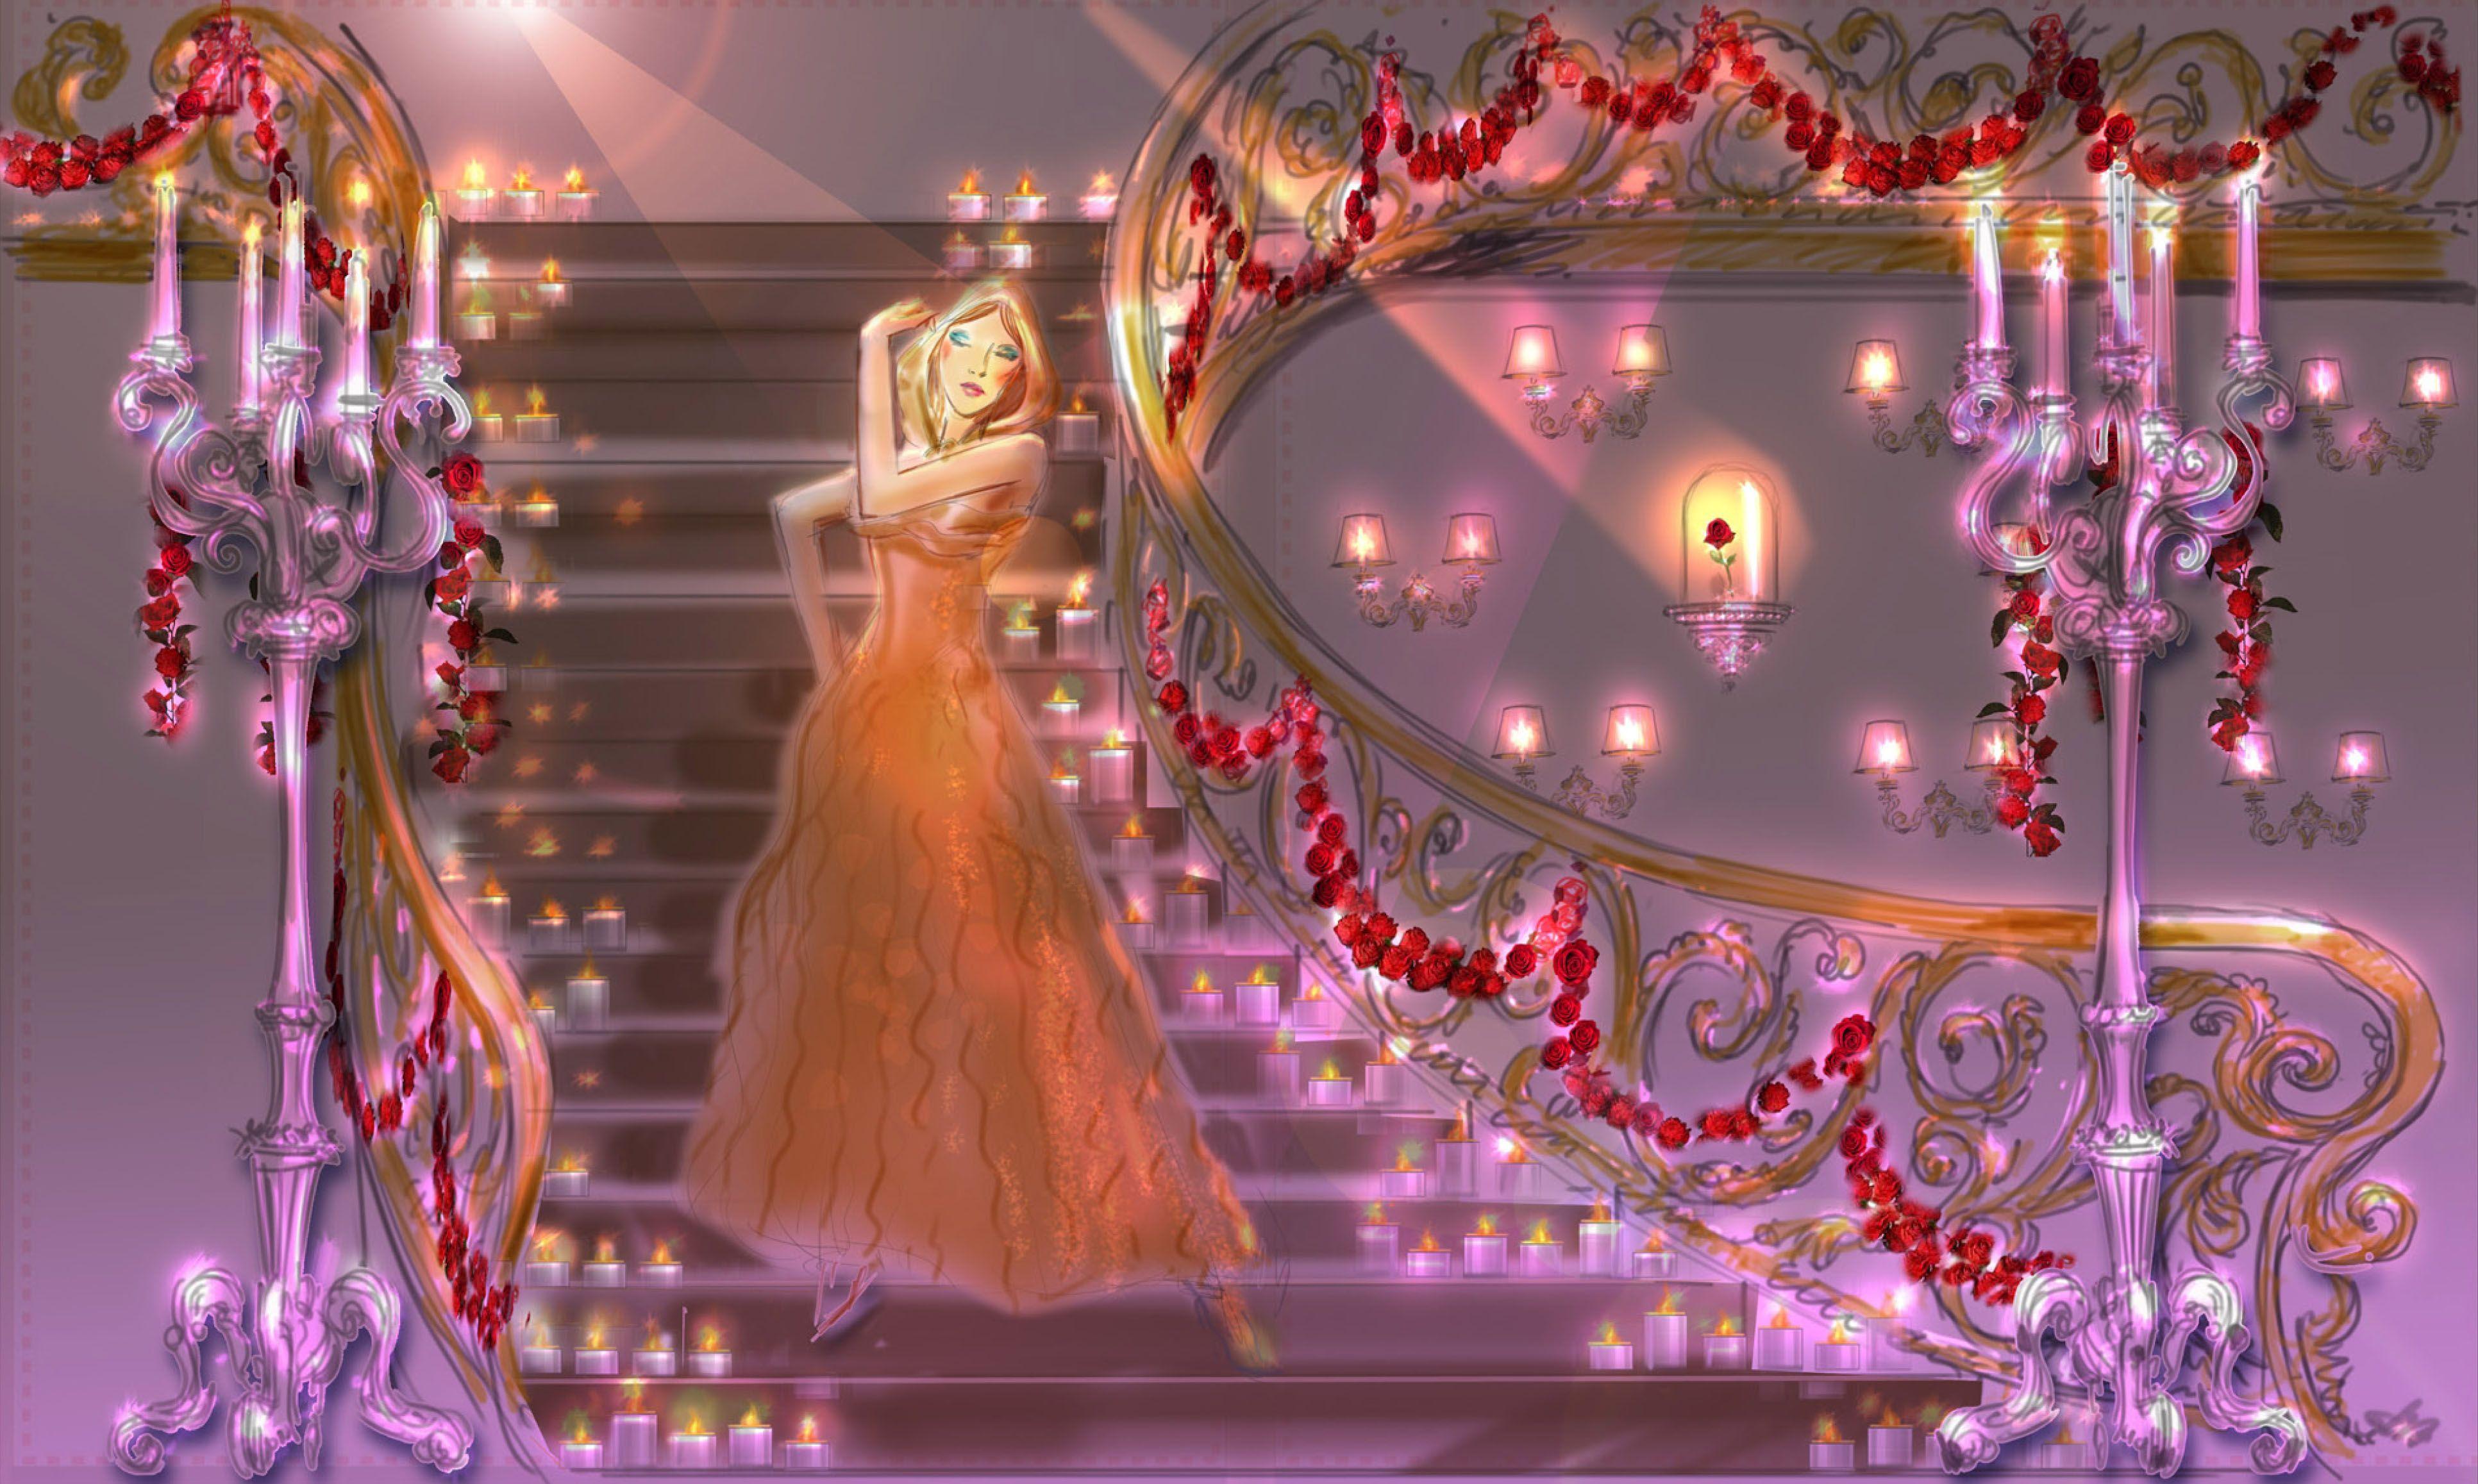 Joyeux Noel Twilight.Once Upon A Dream Harrods Disney Christmas Windows